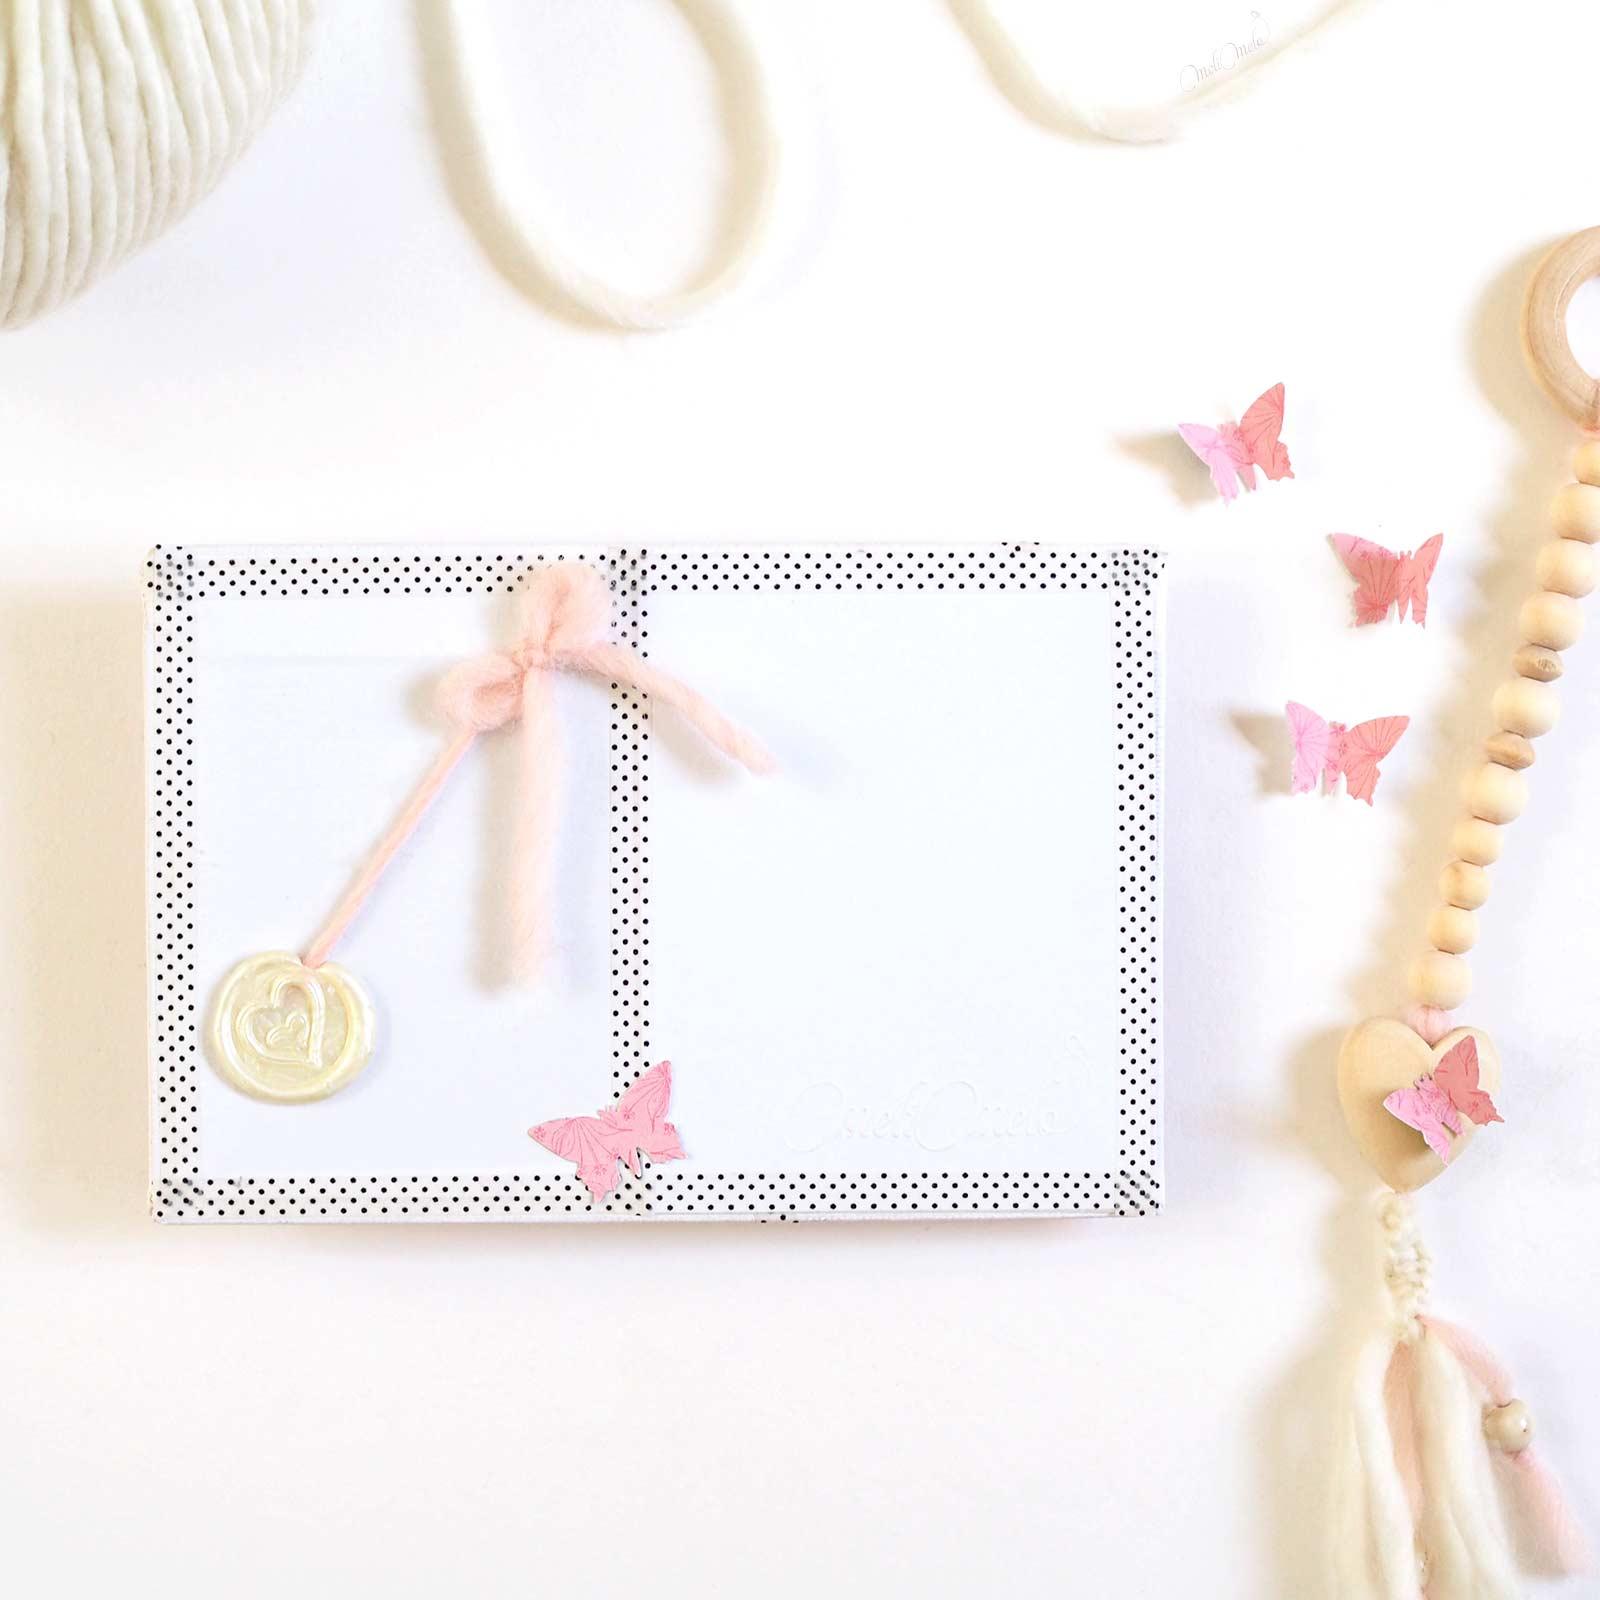 happymail rose envers mini-tissage en laine merinos weareknitters carte postale crafts scrapbooking laboutiquedemelimelo